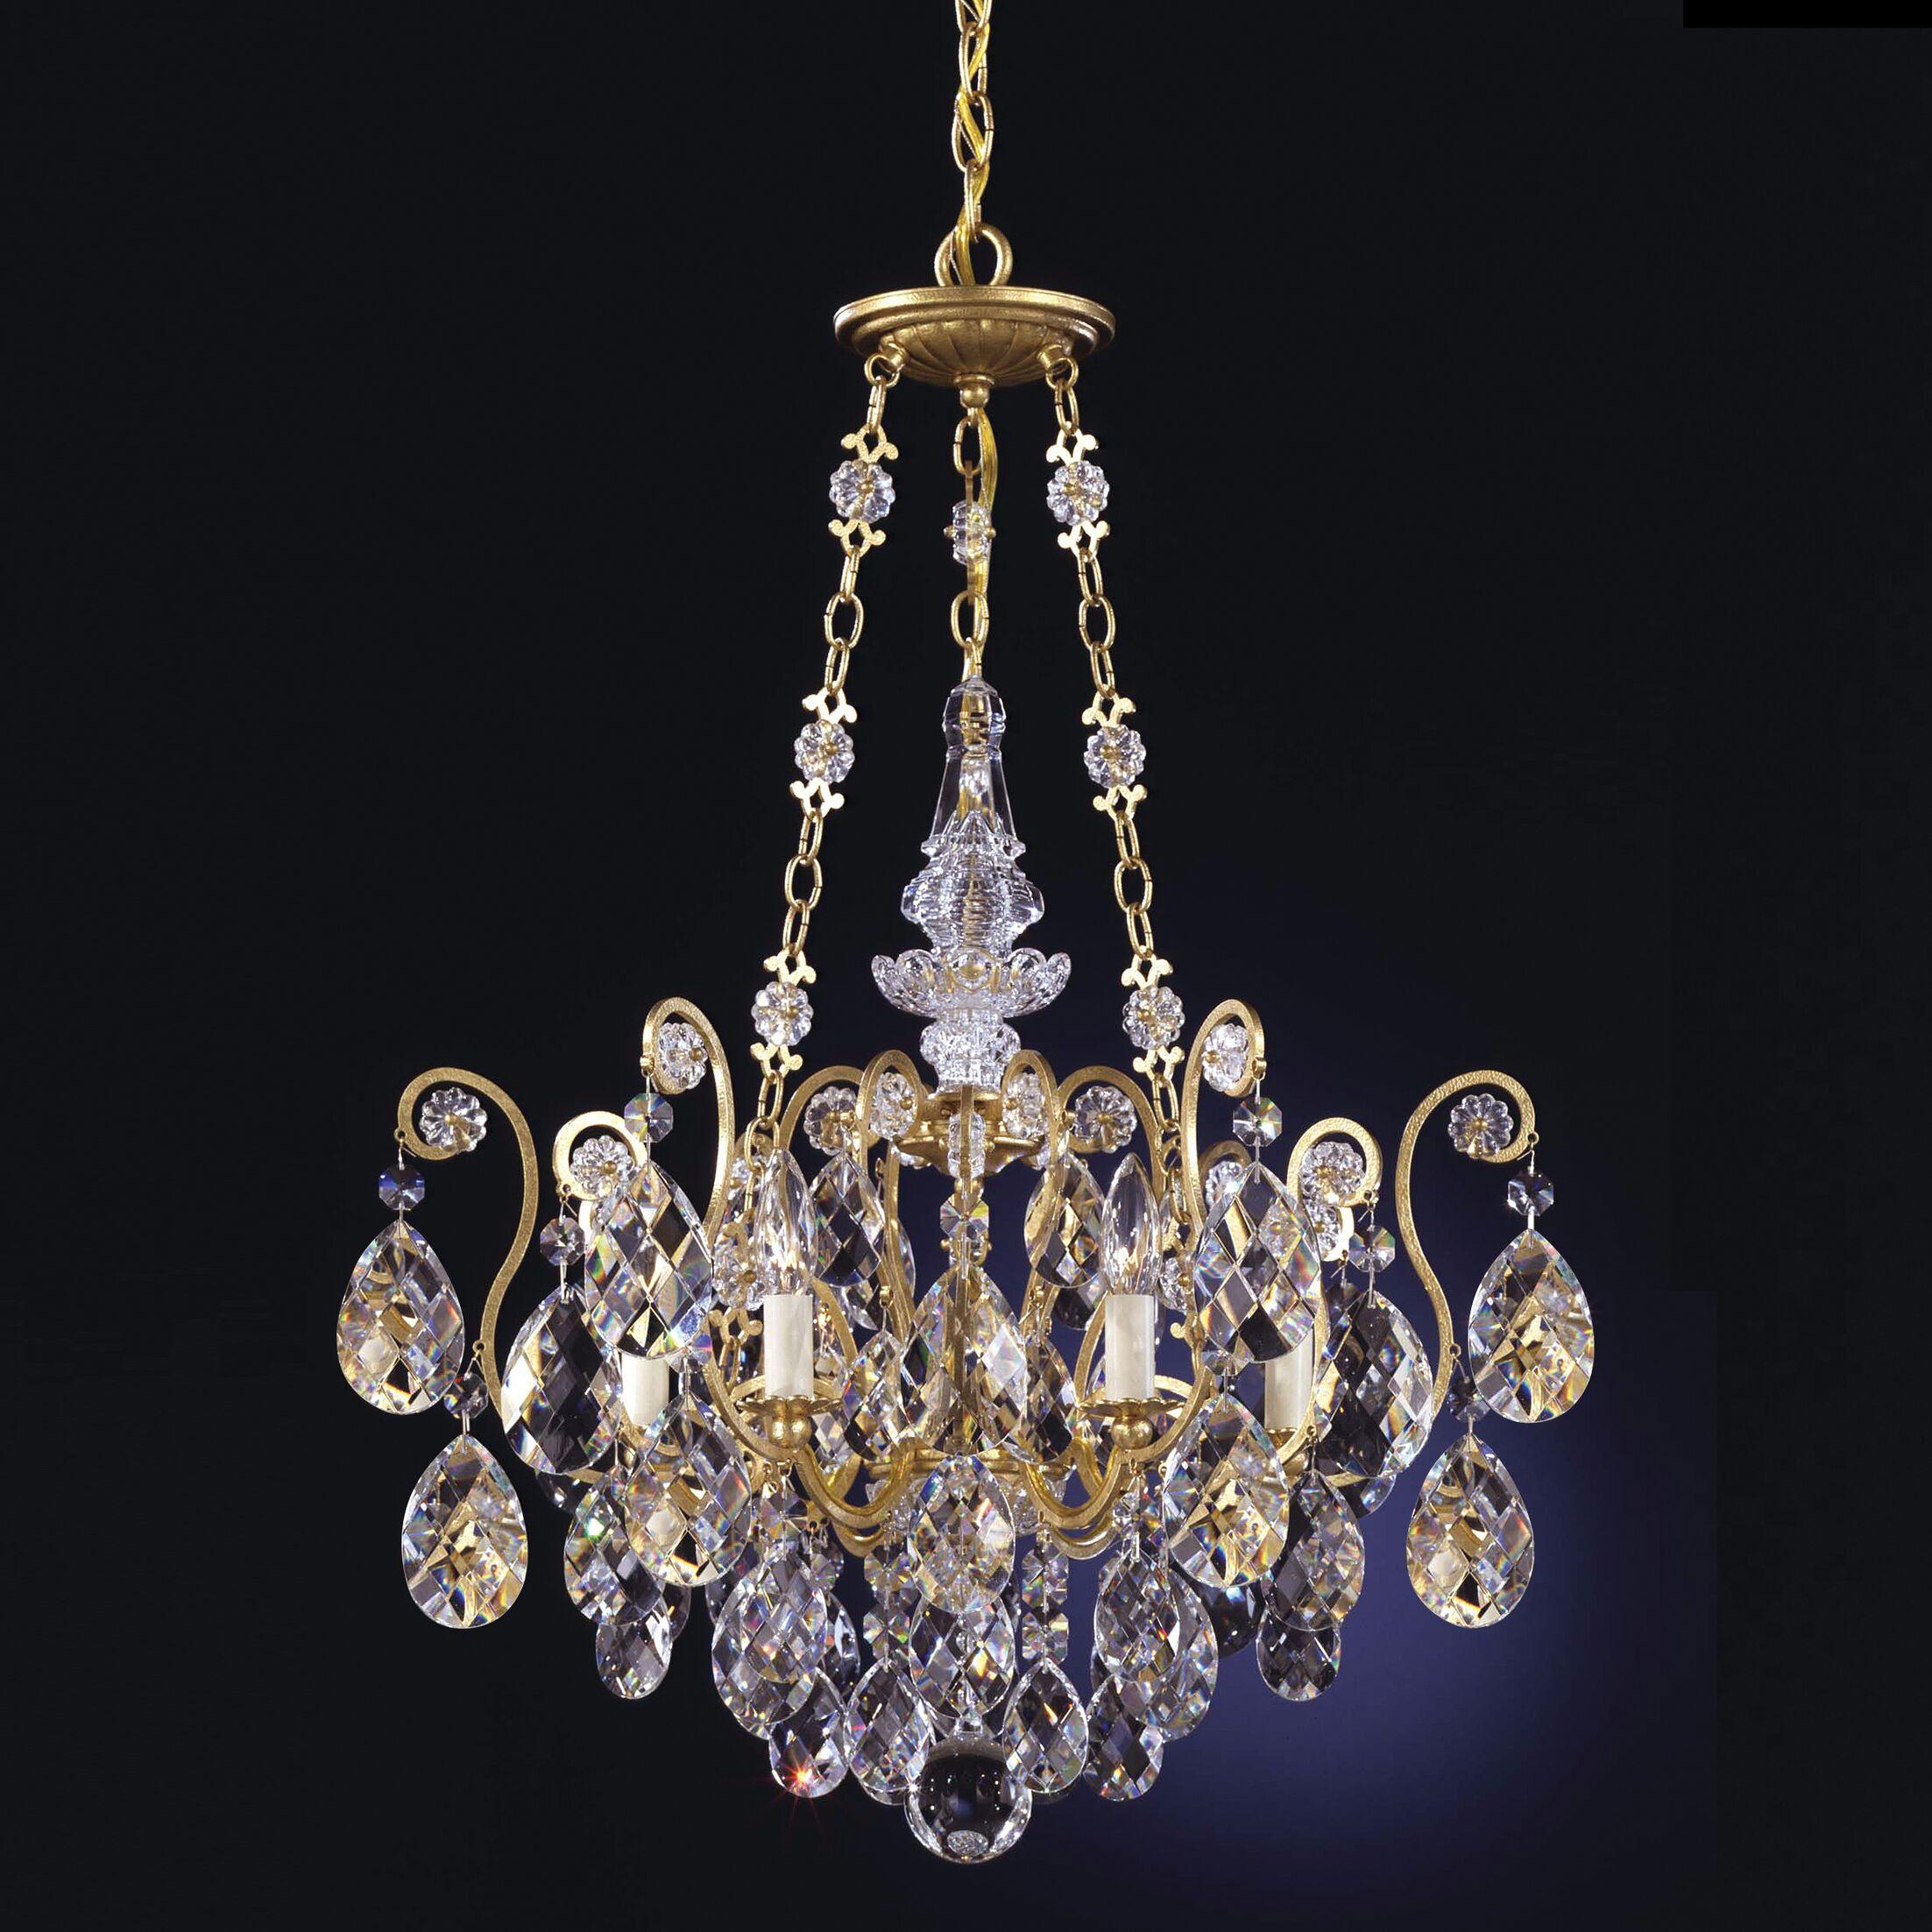 Renaissance 6-Light Chandelier Finish / Crystal Color: Antique Silver / Handcut Clear